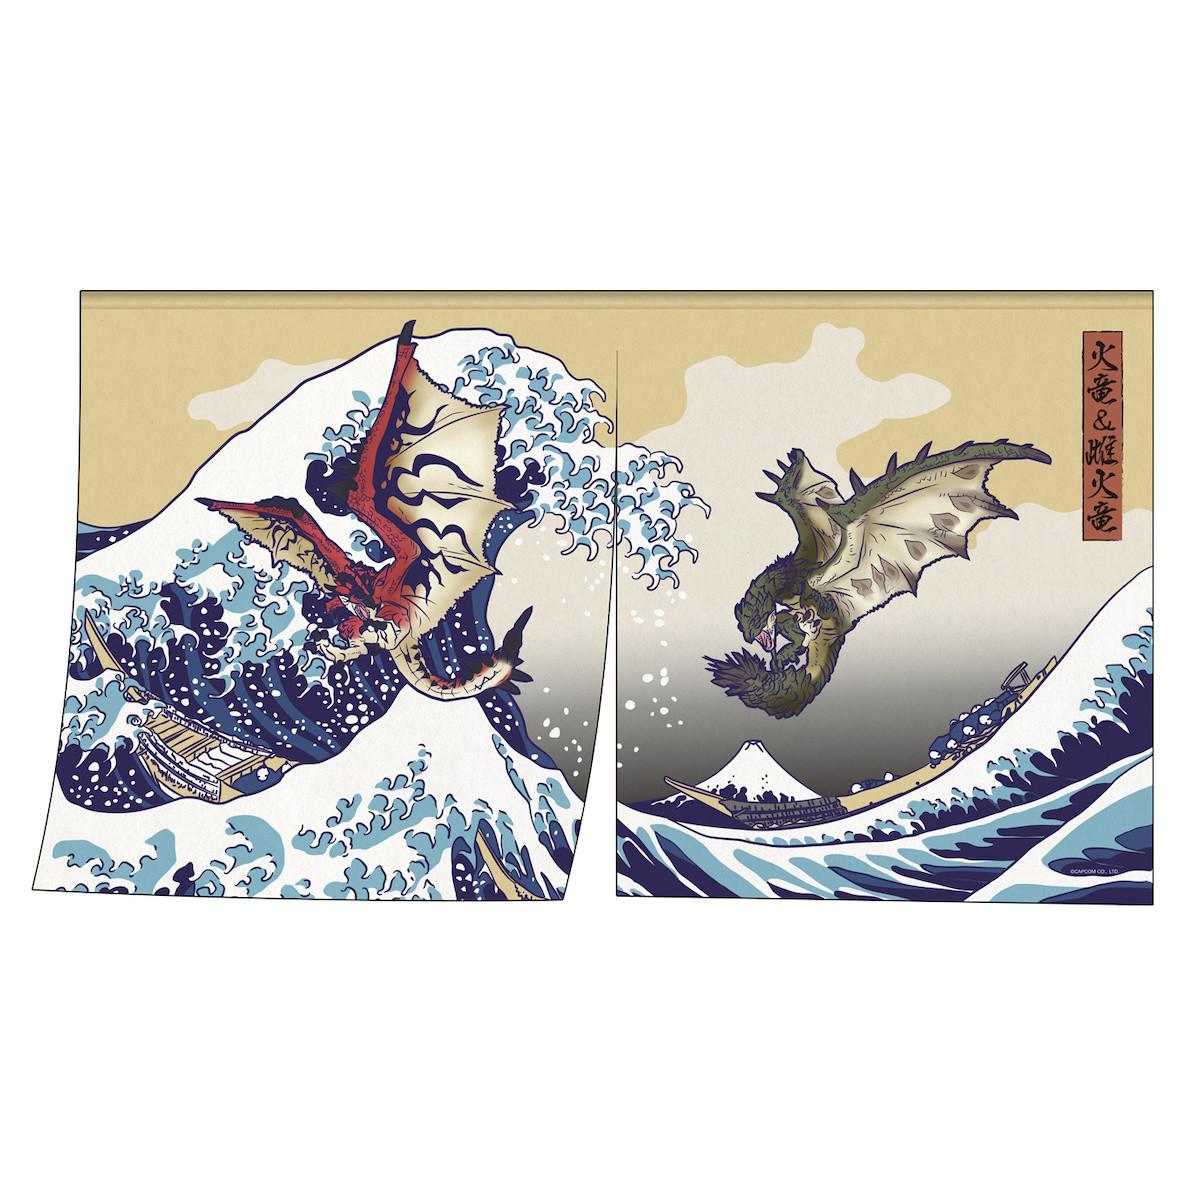 Monster Hunter Rathalos Rathian X Fugaku Ukiyo E Noren Tapestry